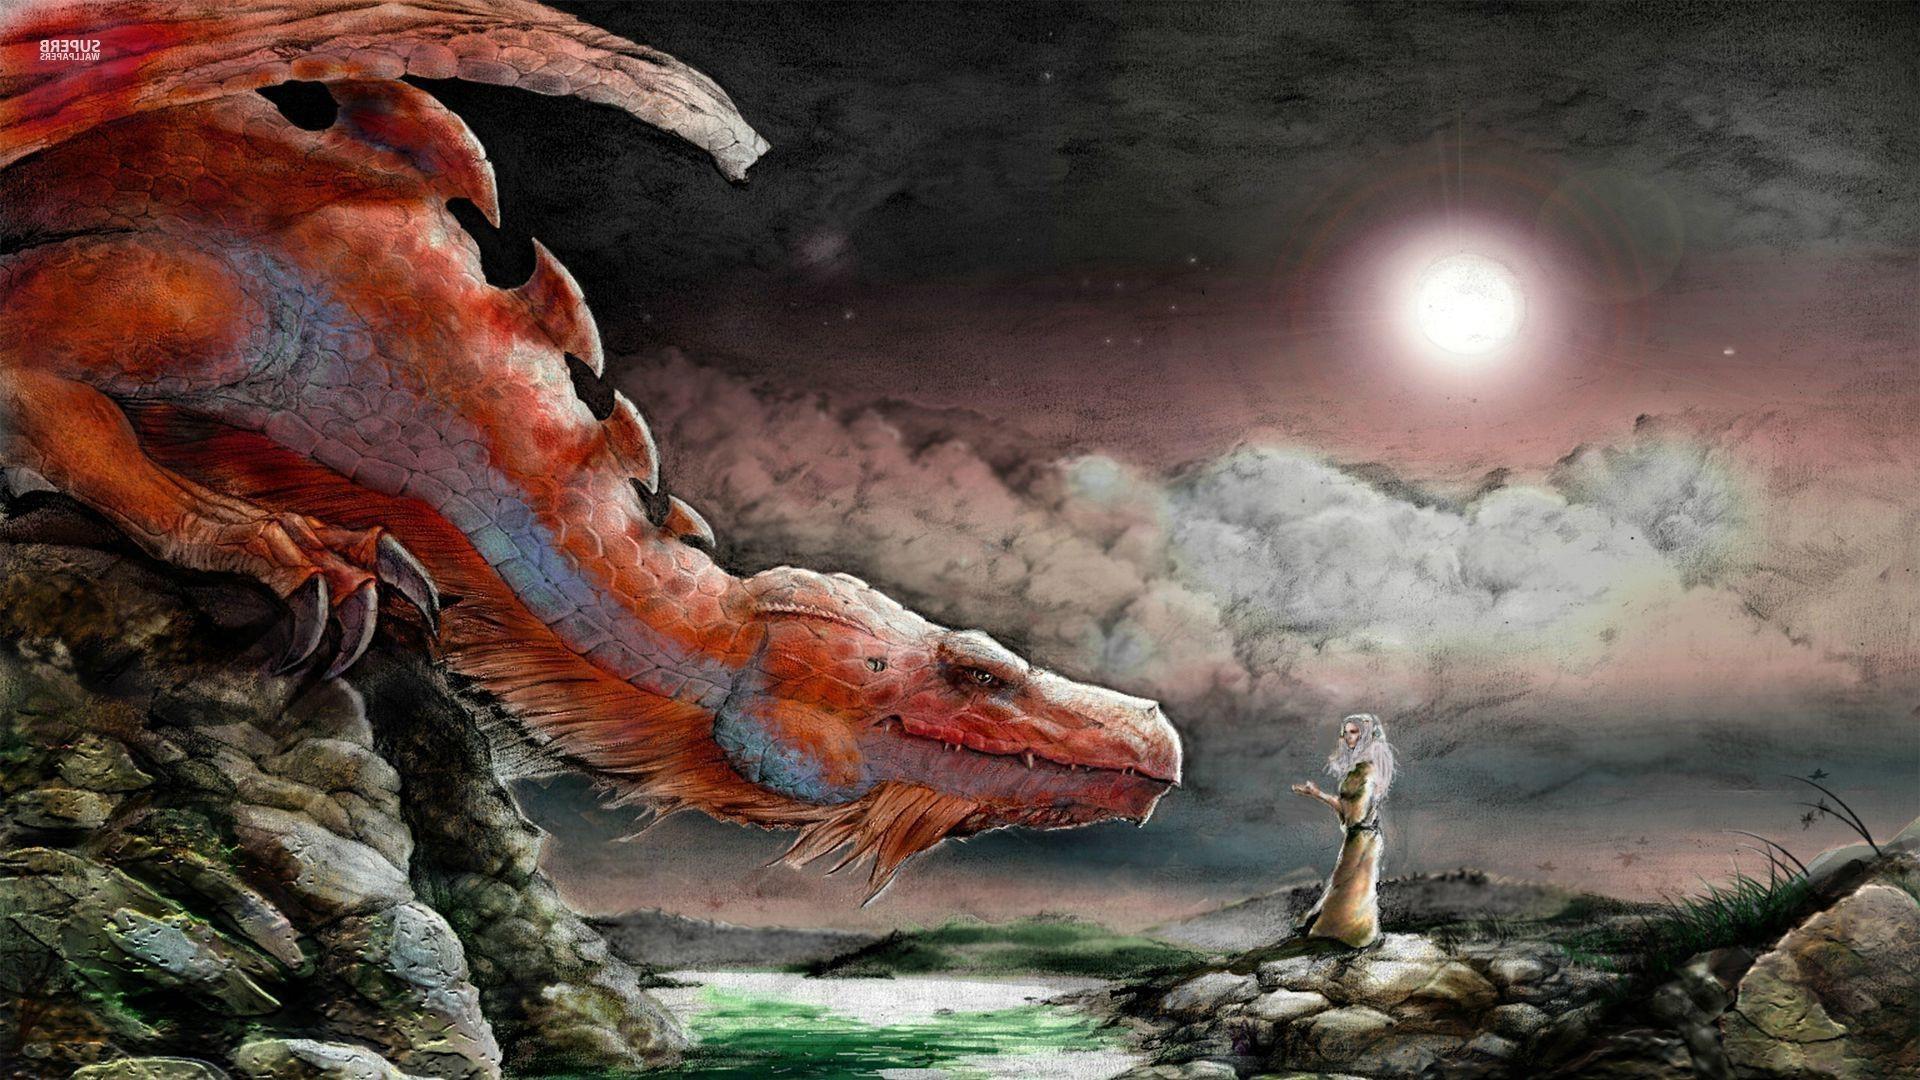 Wallpaper 1920x1080 px clouds digital art dragon - Fantasy wallpaper digital art ...